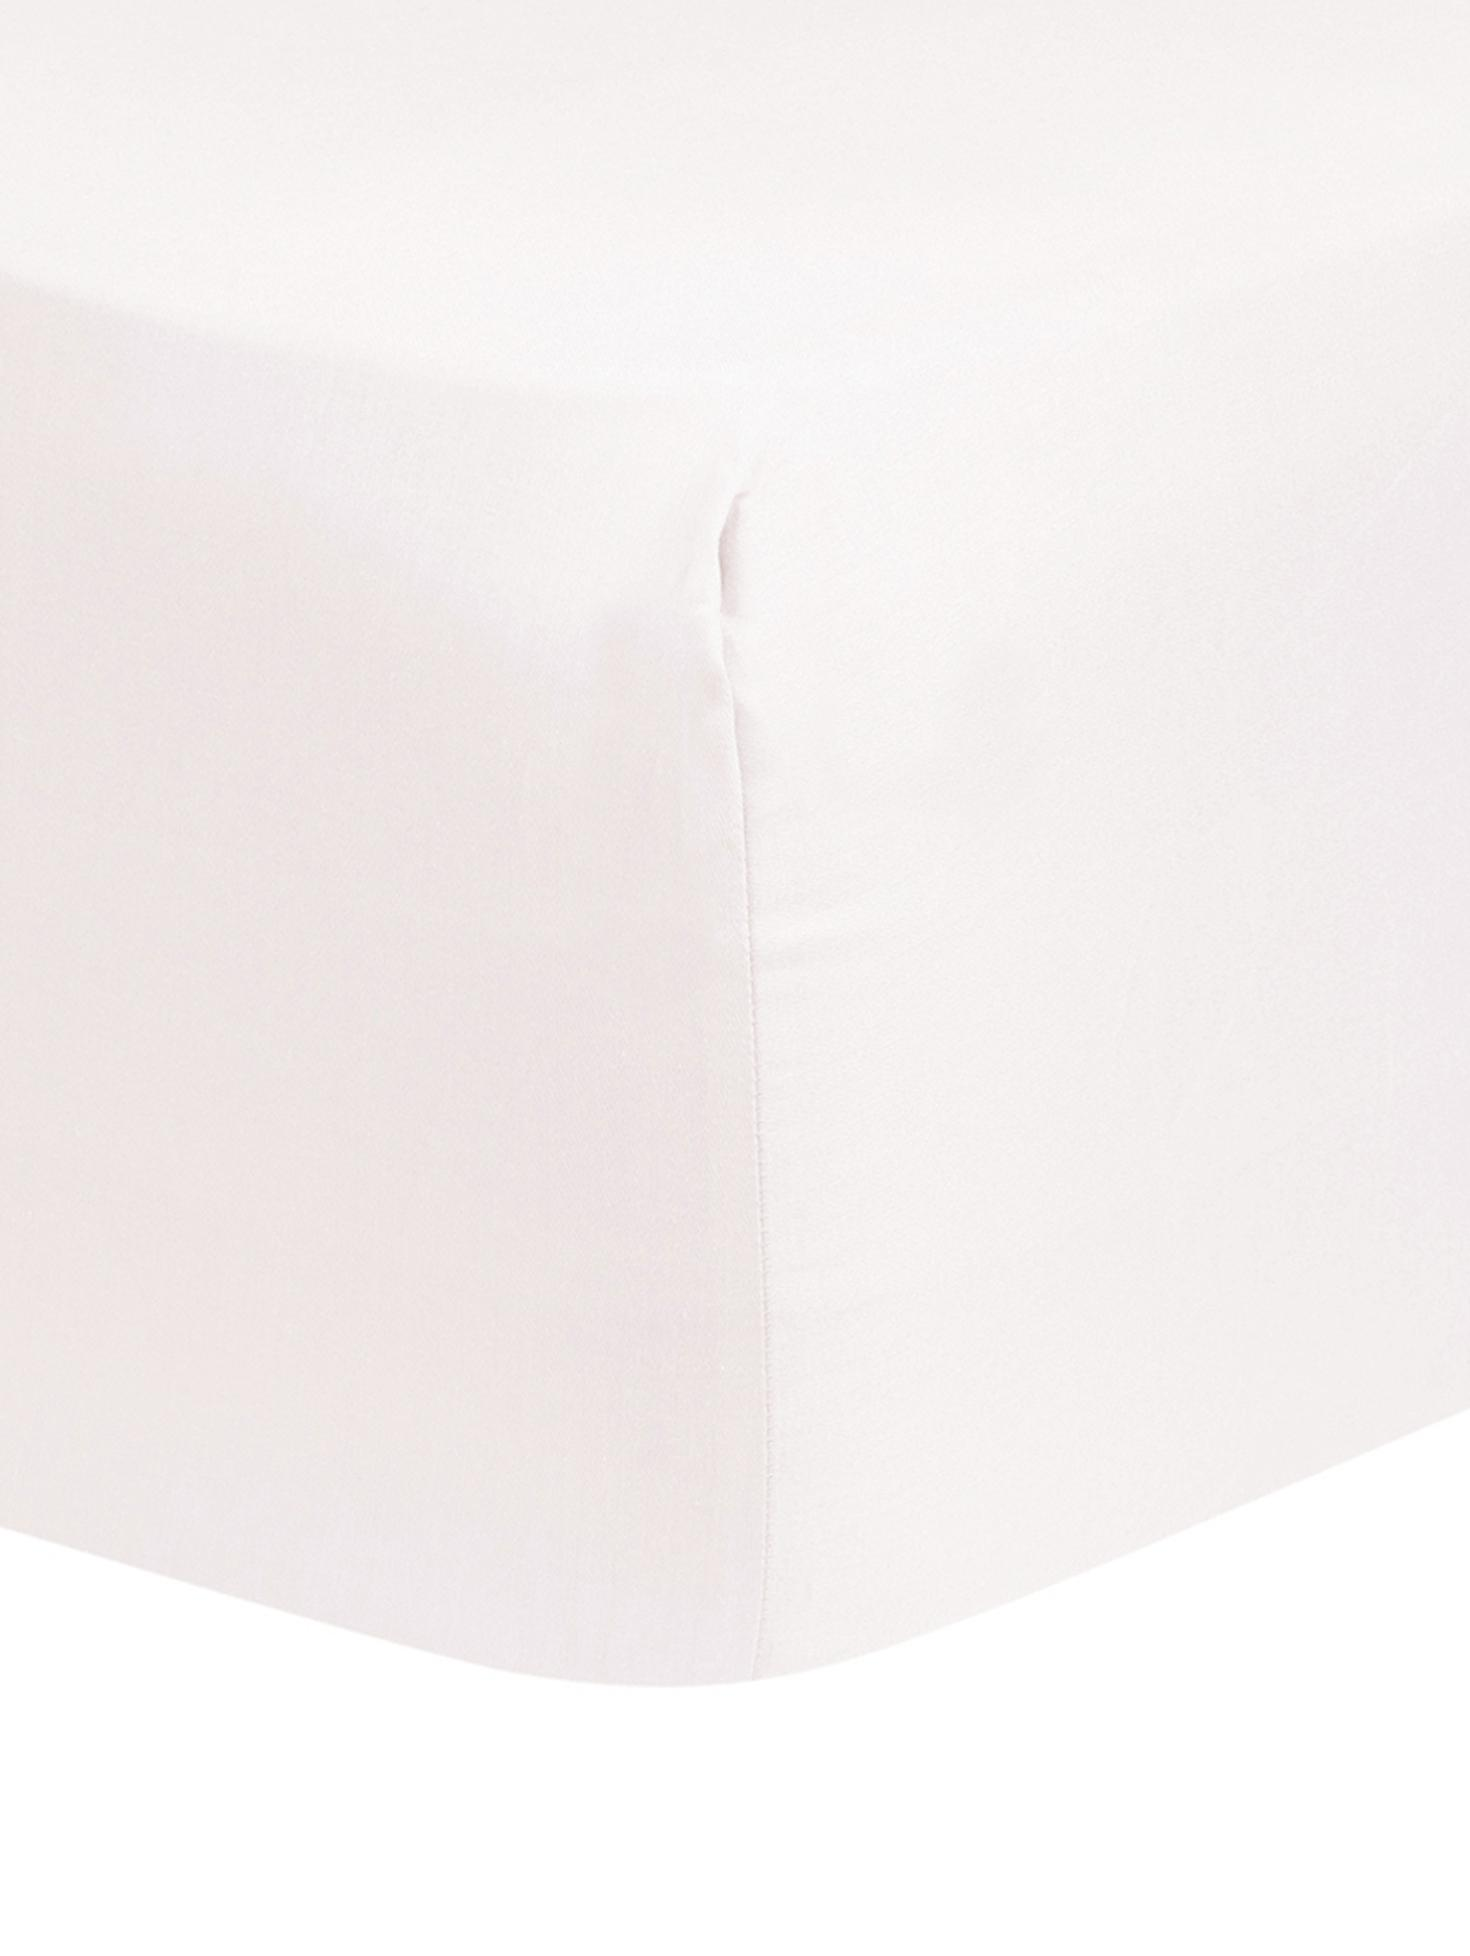 Sábana bajera de satén Comfort, Rosa, Cama 135/140 cm (140 x 200 cm)